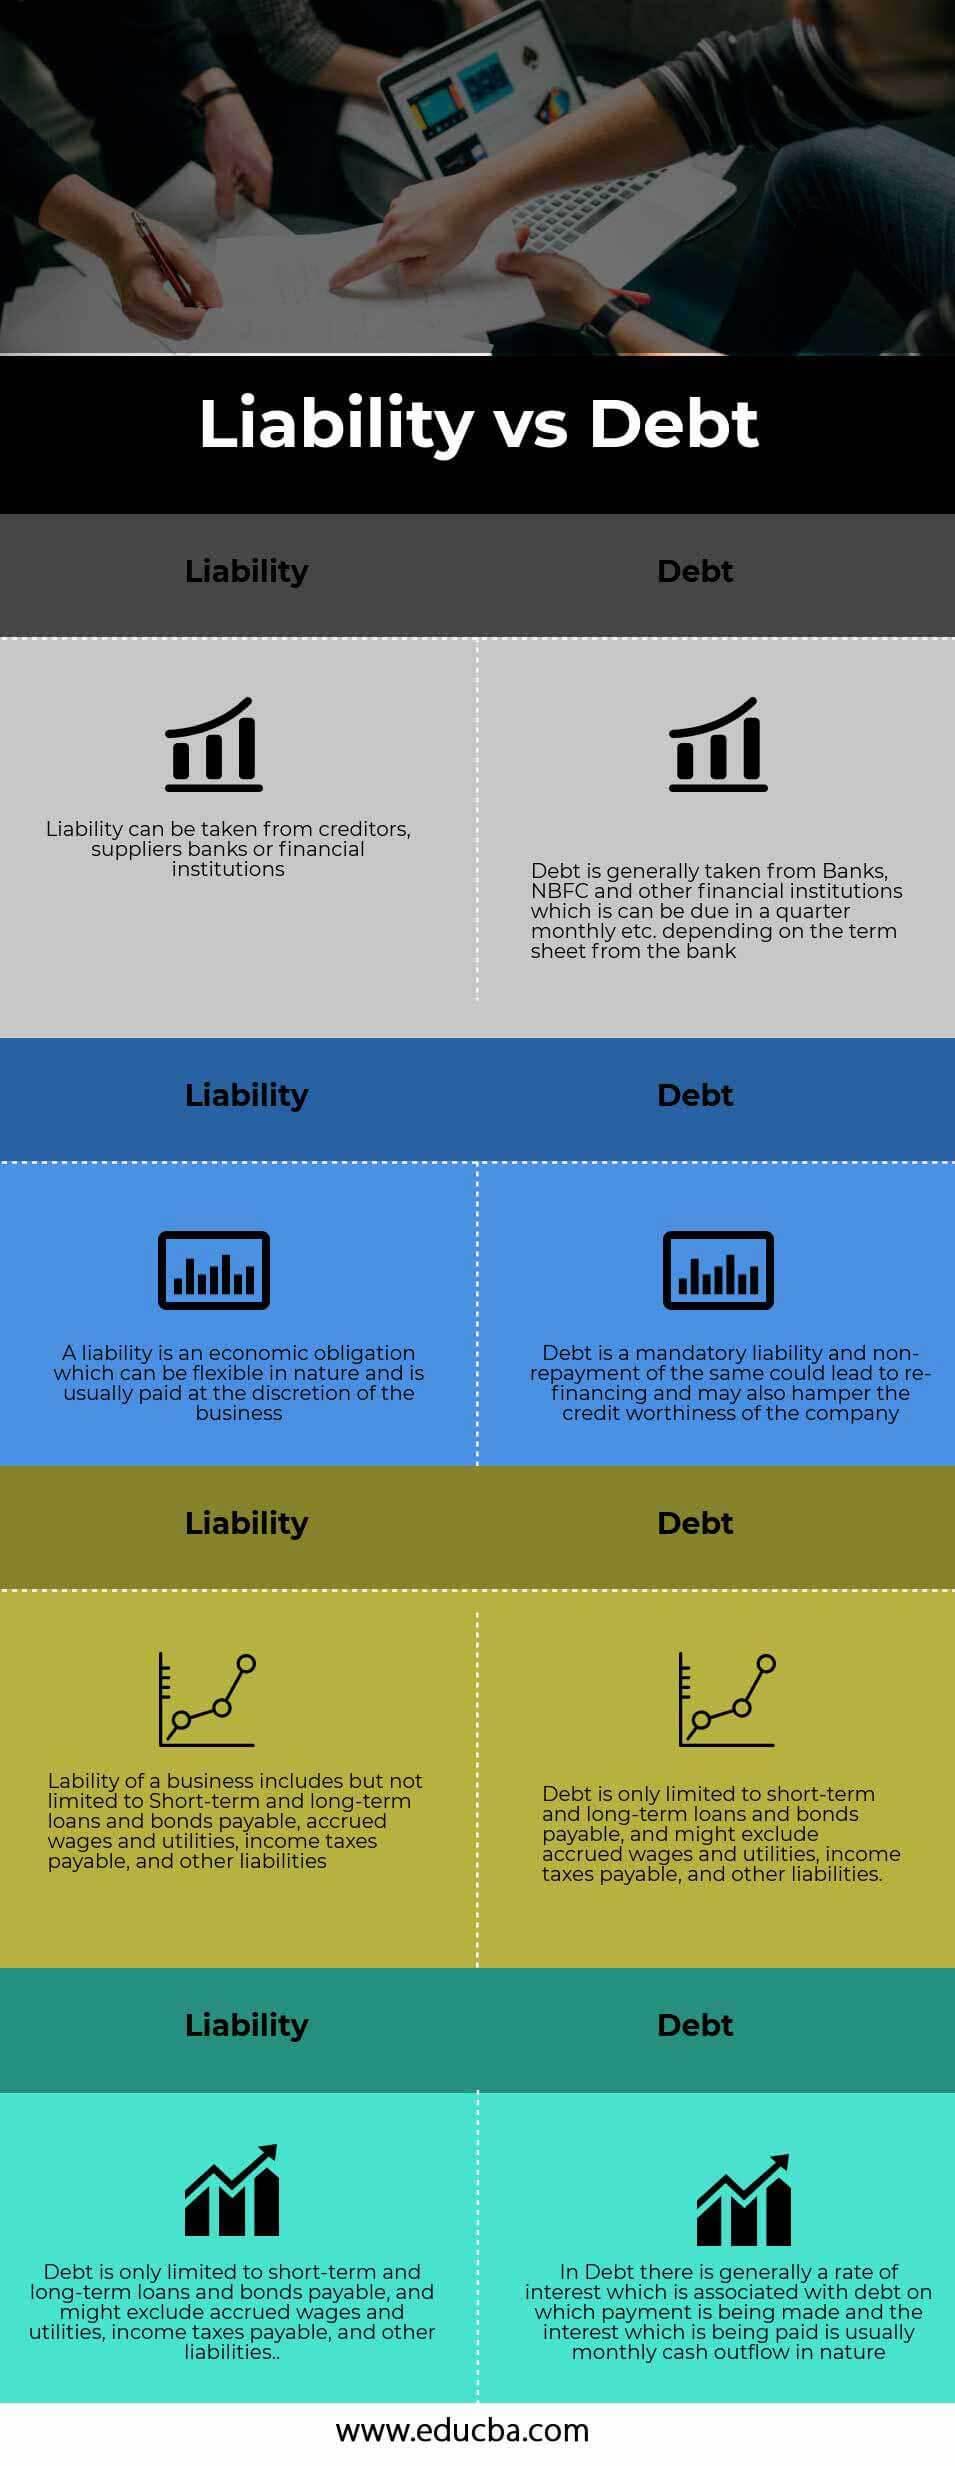 Liability-vs-Debt-info